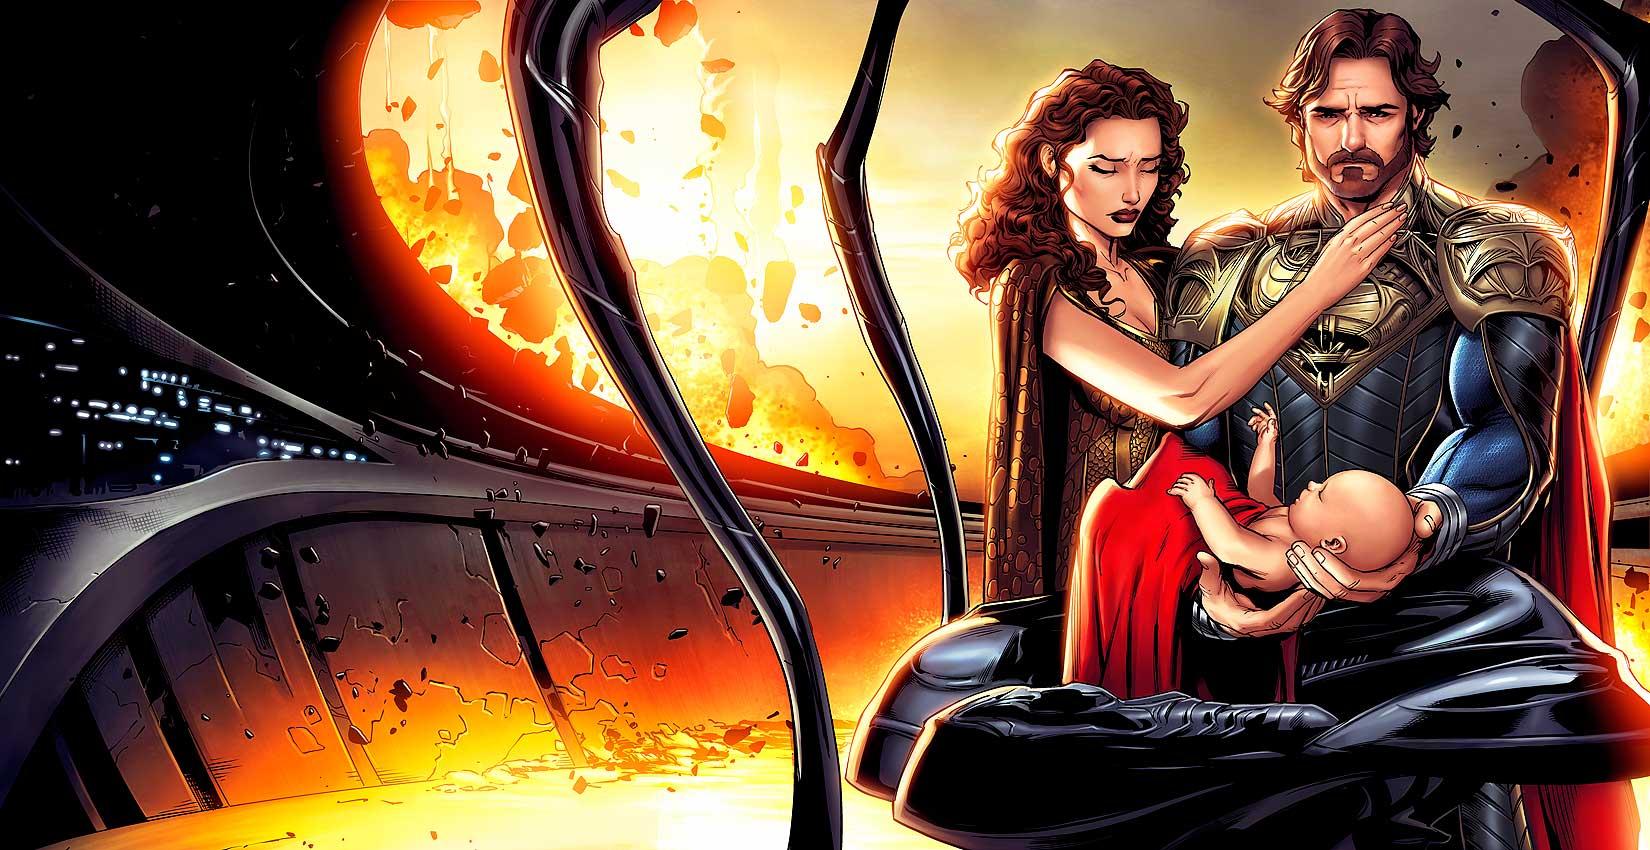 http://fc05.deviantart.net/fs71/f/2013/183/2/e/man_of_steel__the_fate_of_krypton_page_5_by_jprart-d6bpn4i.jpg